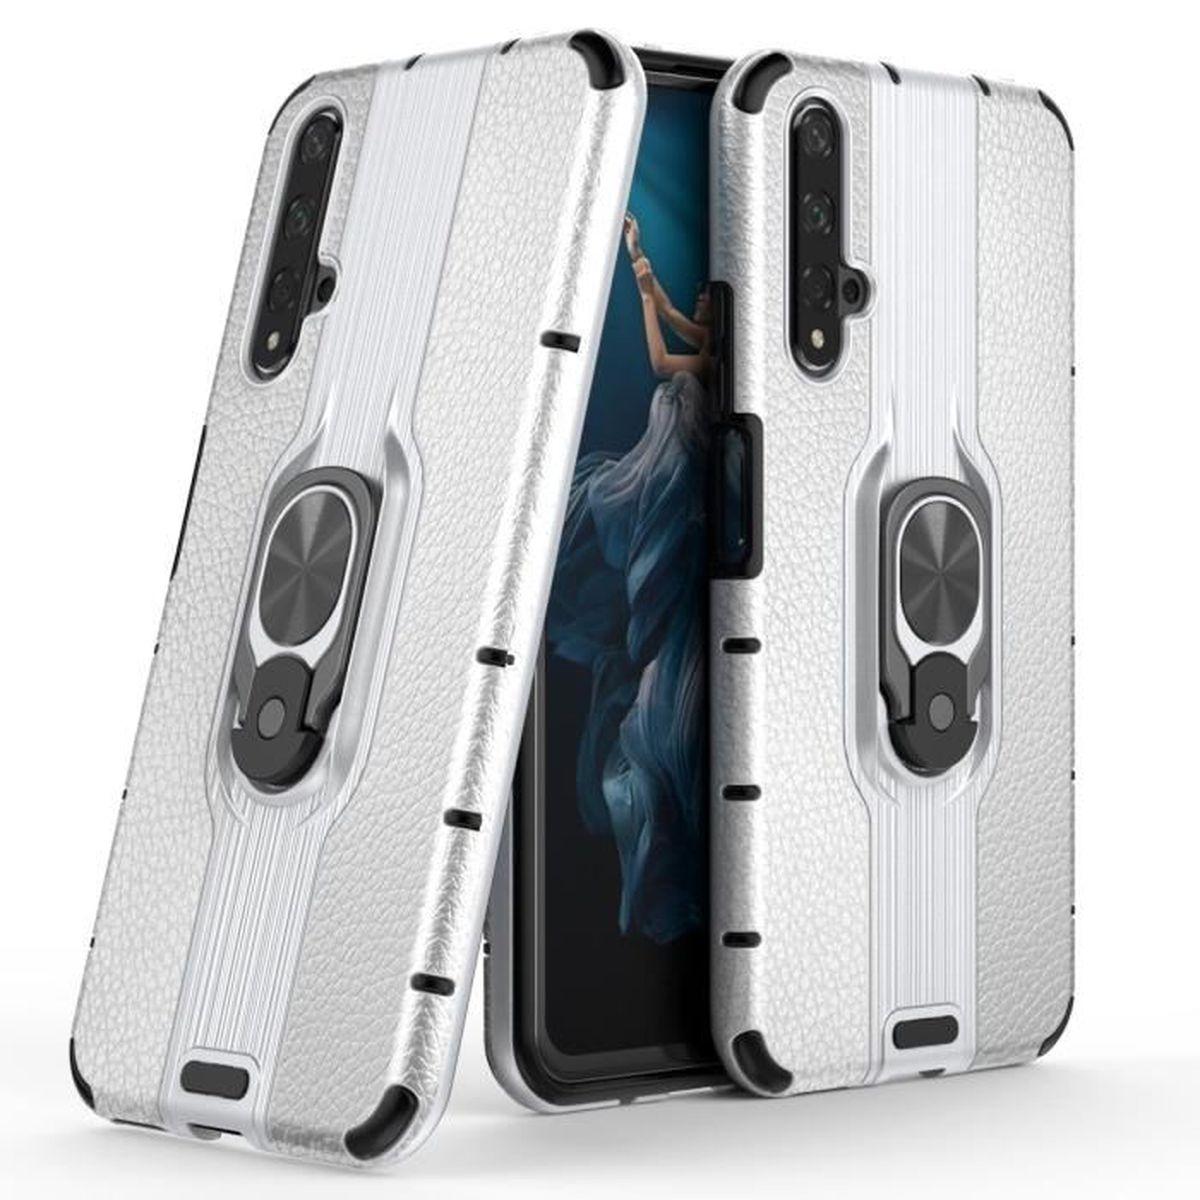 Coque Huawei Nova 5T, Etui 2 en 1 Ultra Mince Anti-Choc Souple ...